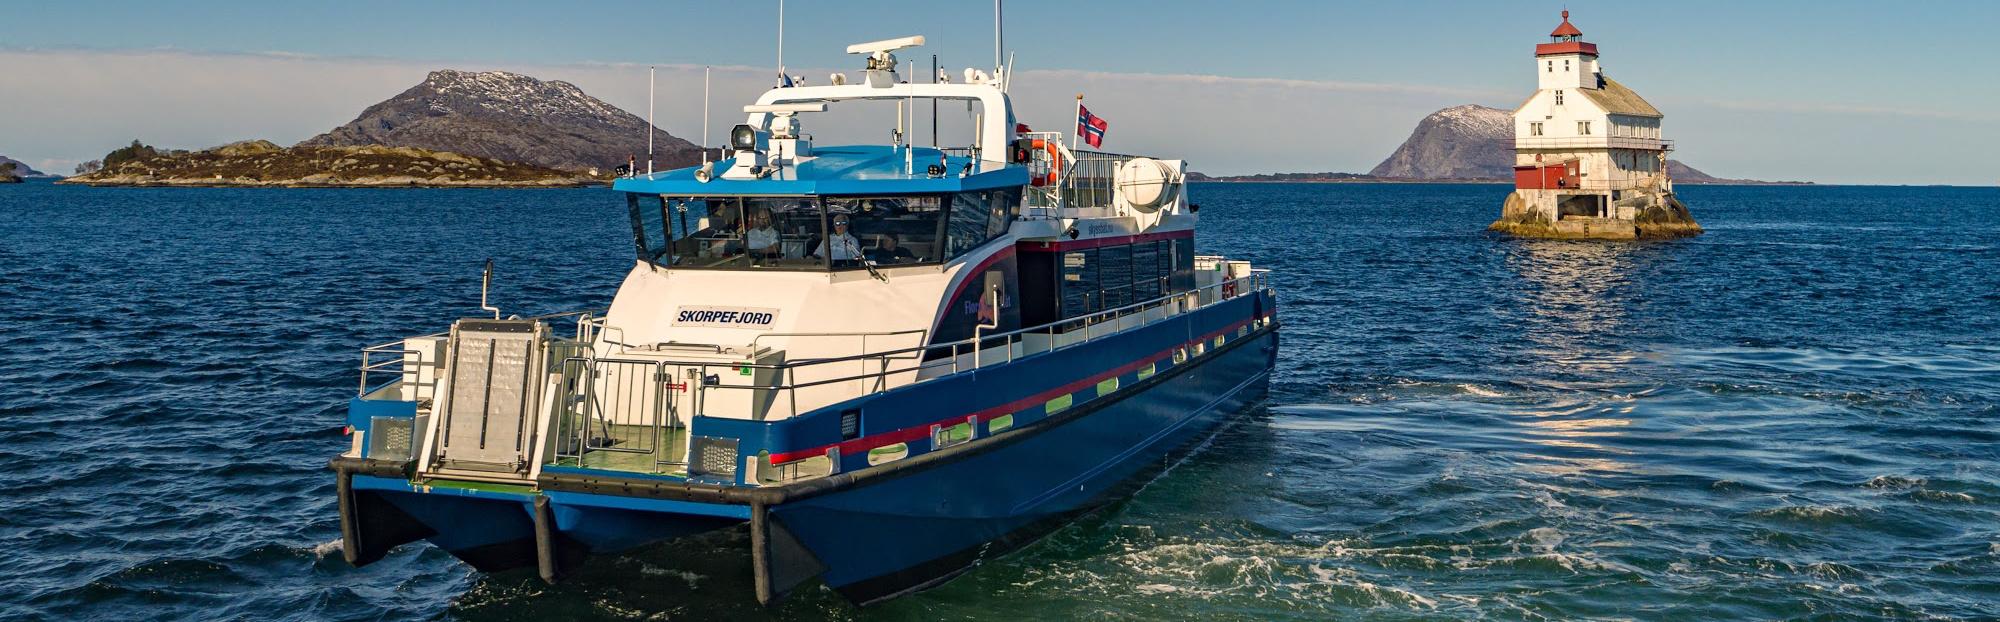 Florø Skyssbåt - M/S Skorpefjord ved Stabben fyr - skyssbat.no